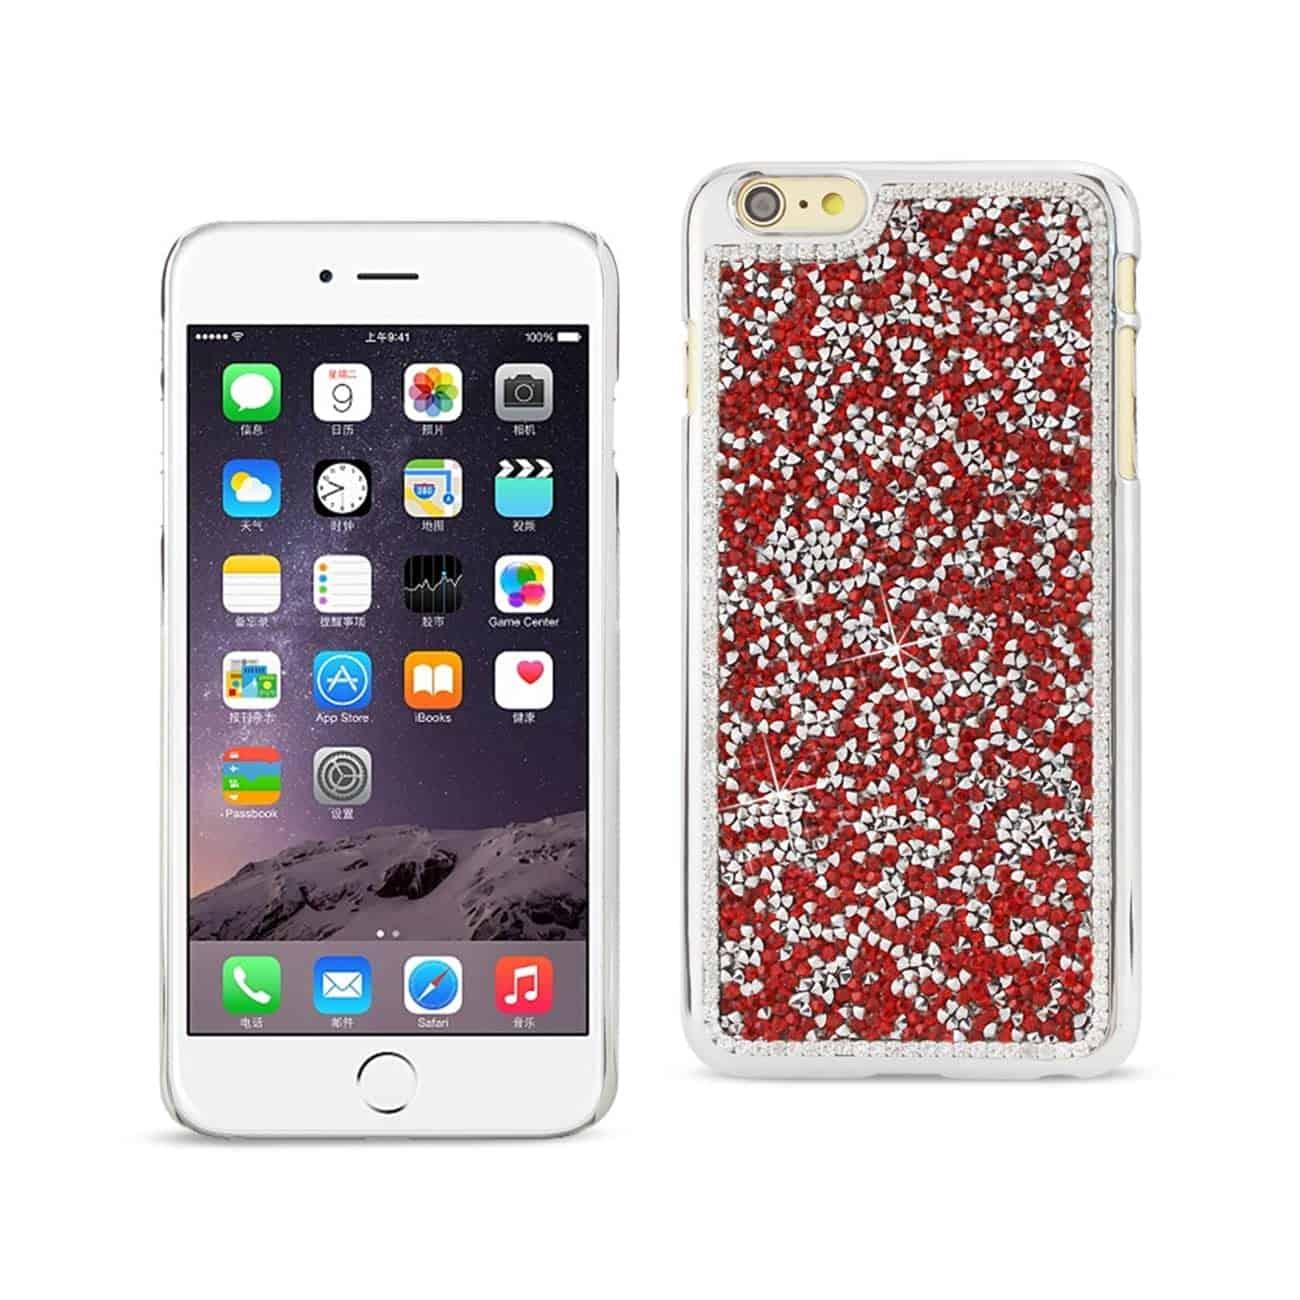 IPHONE 6 PLUS/ 6S PLUS JEWELRY BLING RHINESTONE CASE IN RED